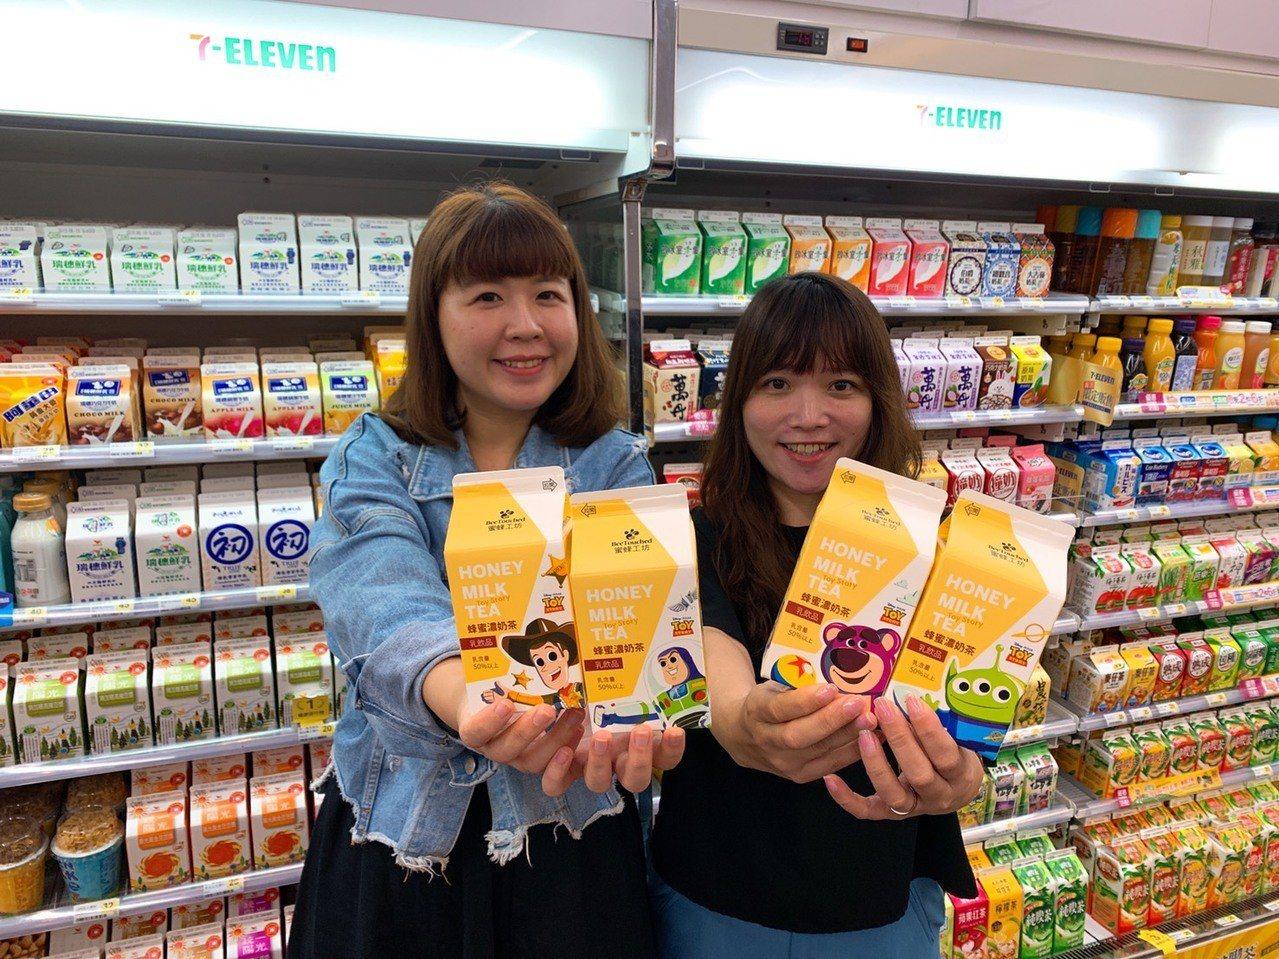 7-ELEVEN於6月17日起推出4款玩具總動員「蜜蜂工坊-蜂蜜濃奶茶」。圖/7...